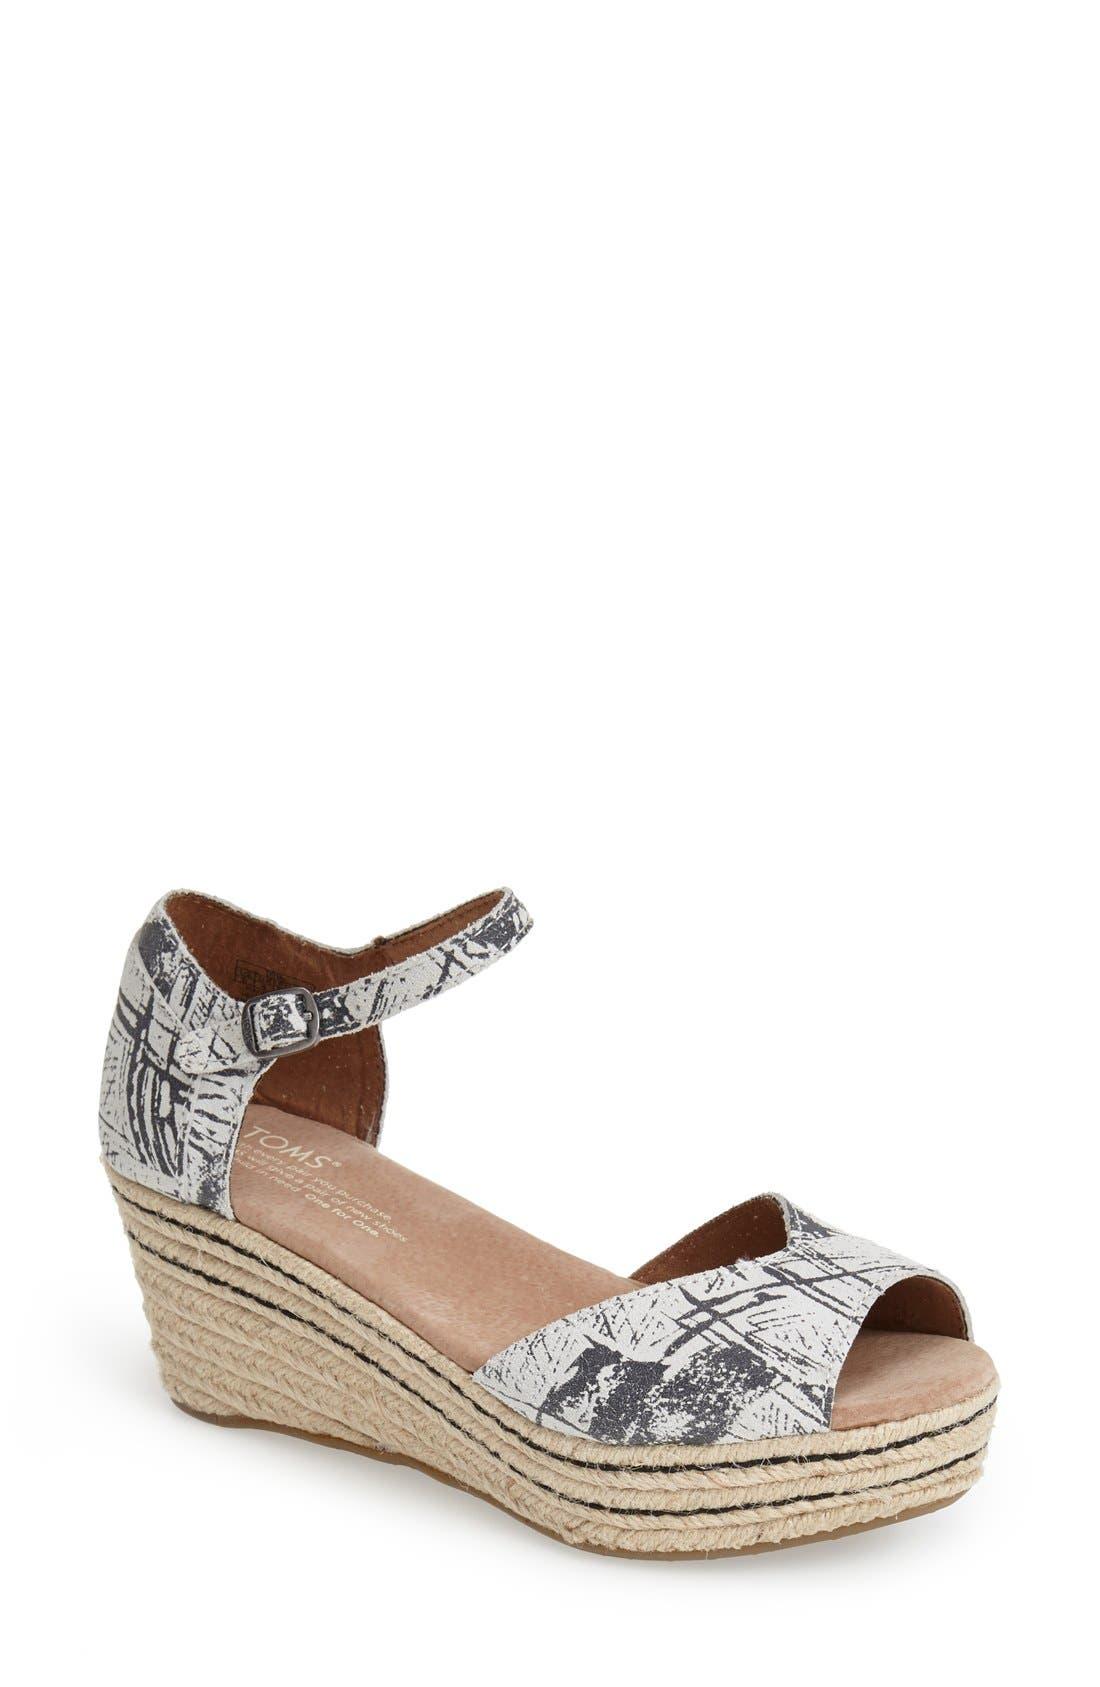 TOMS Espadrille Wedge Sandal (Women)